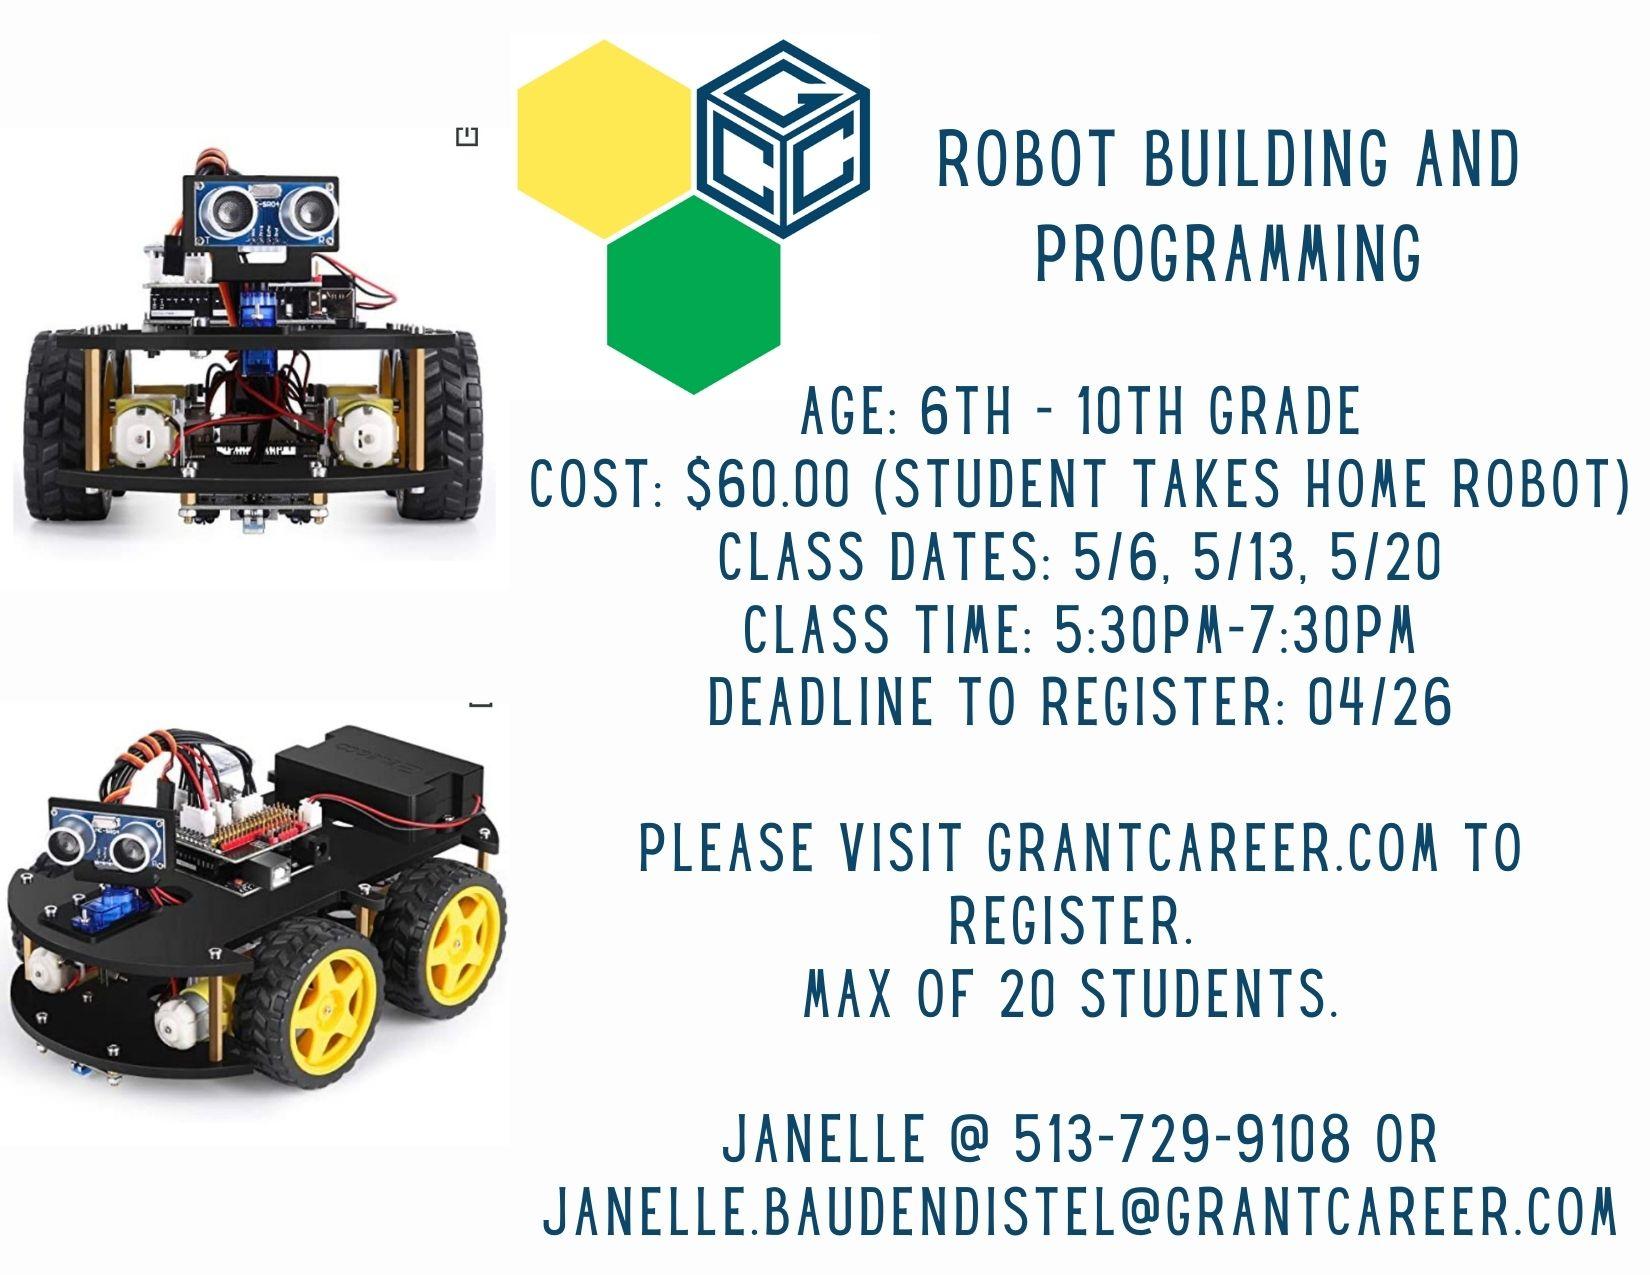 Robot Building and Programing